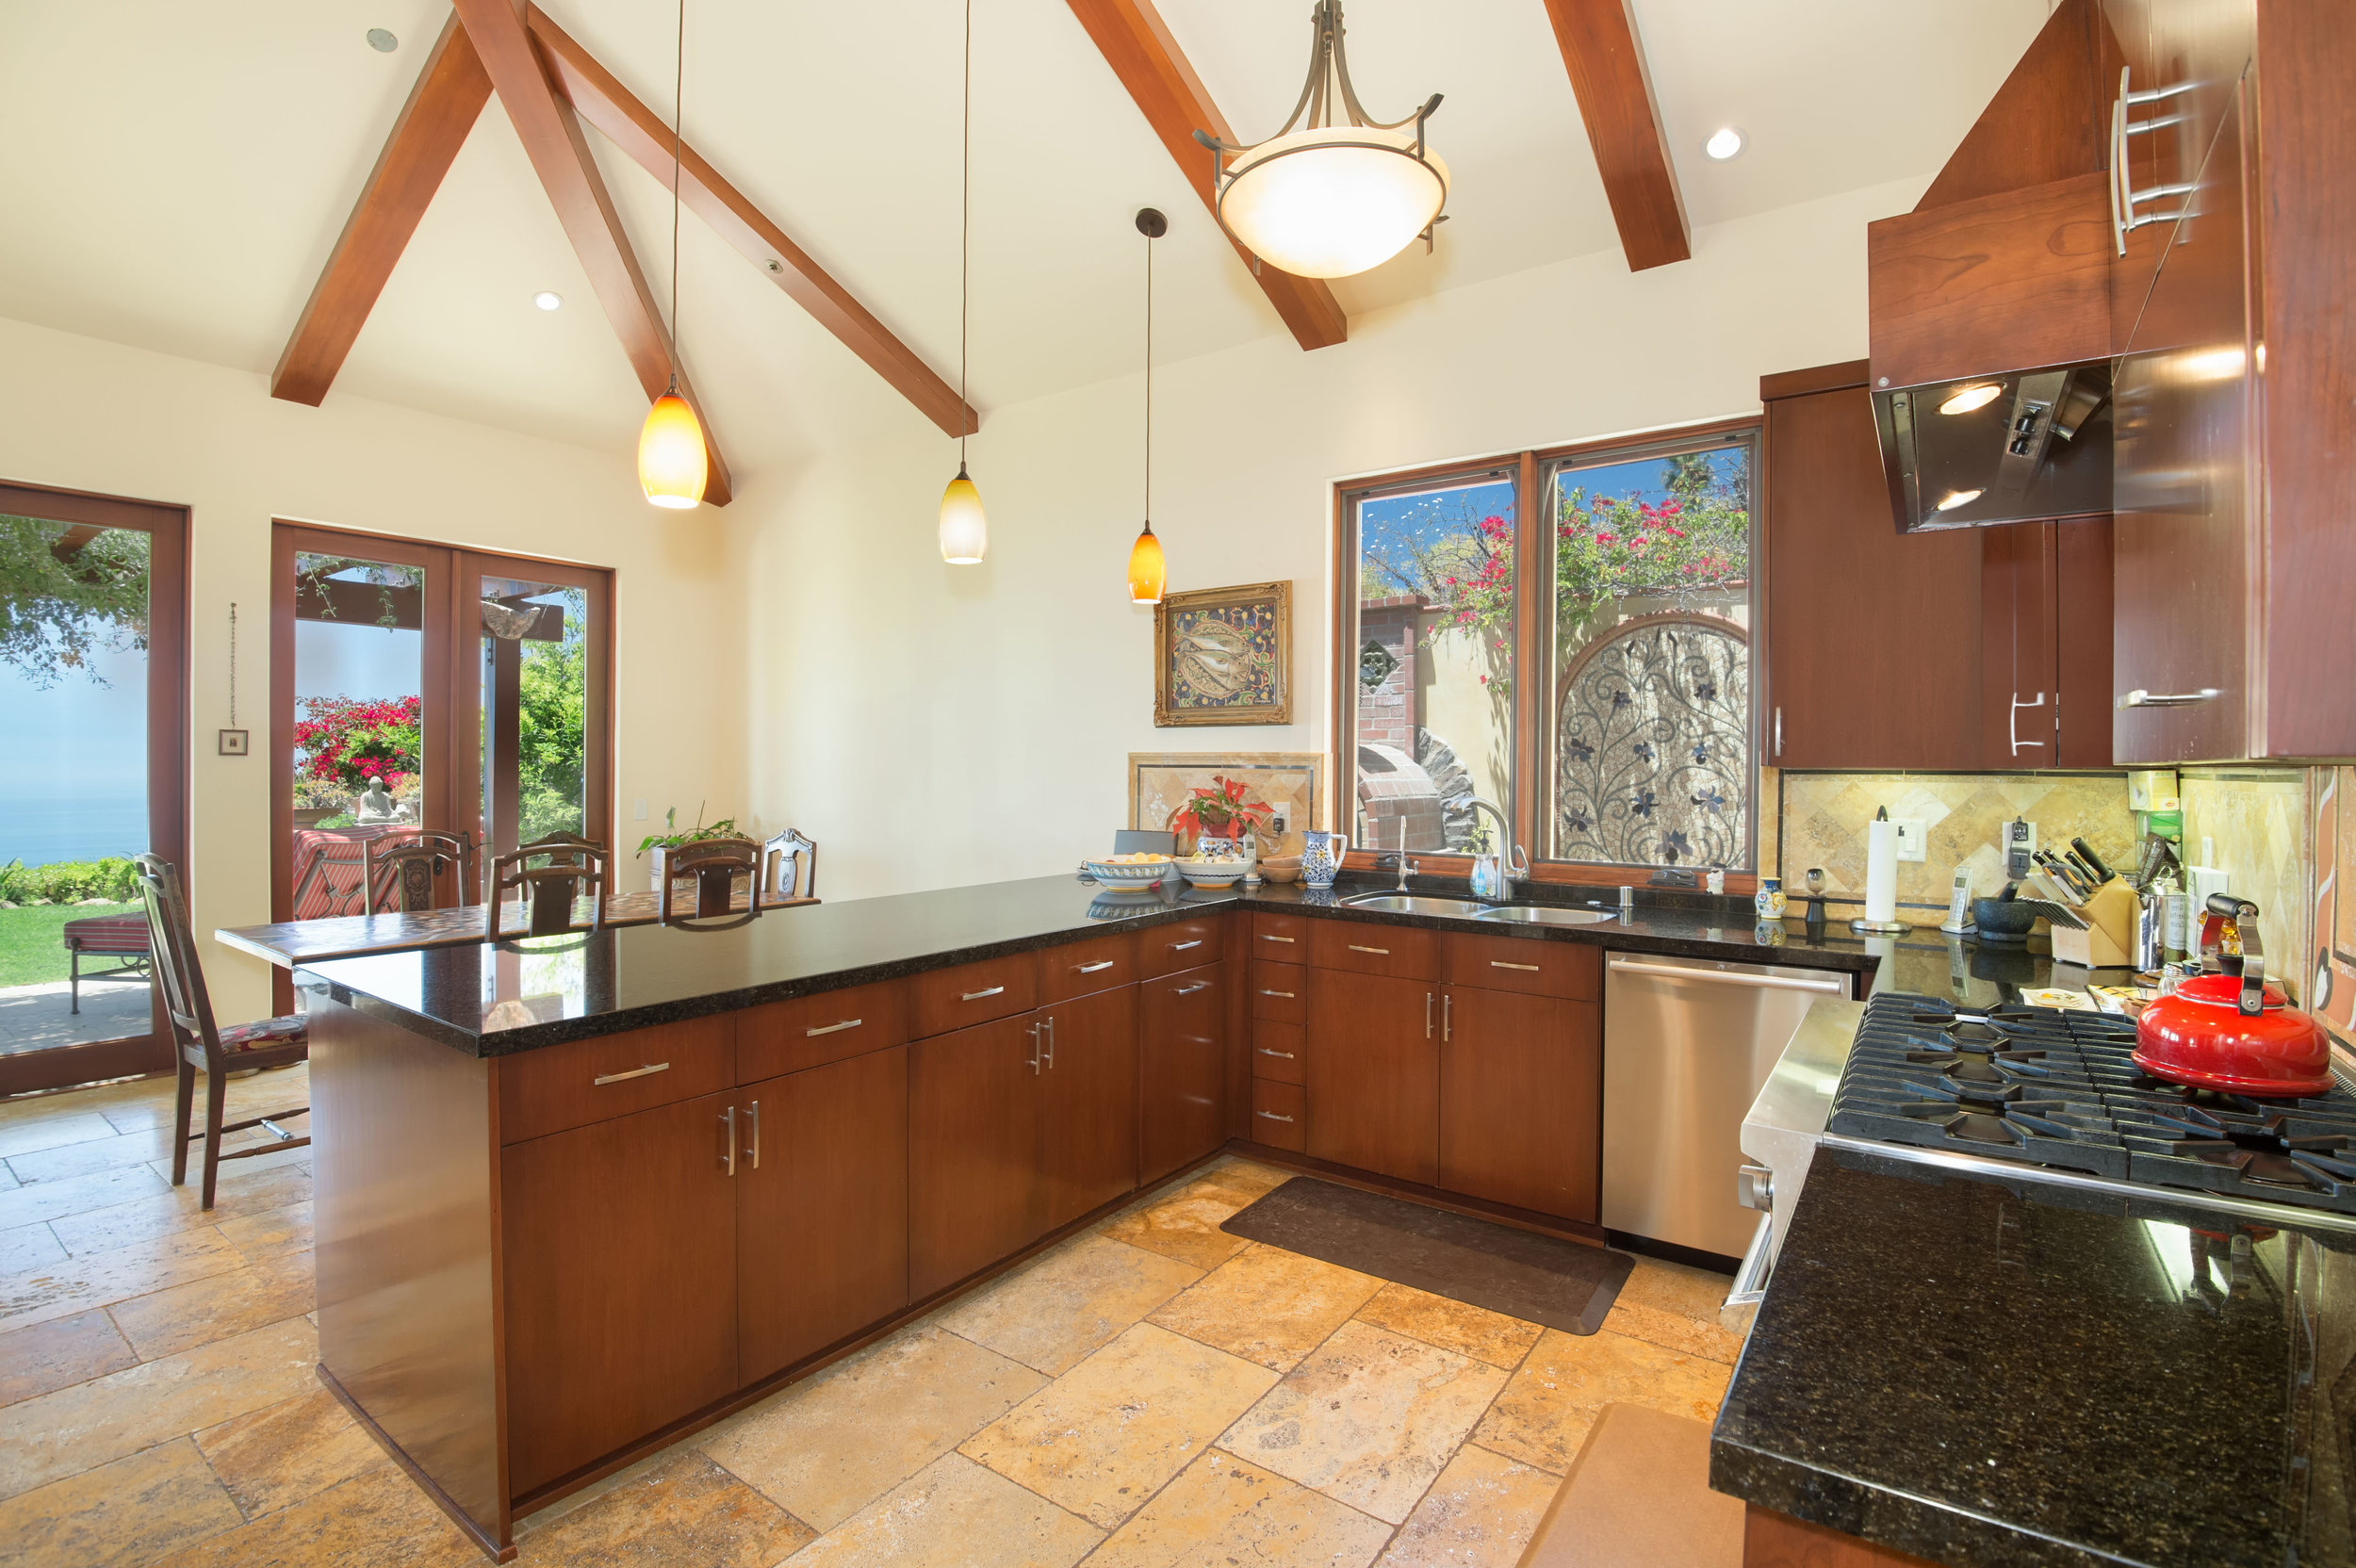 007 Kitchen 26303 Lockwood Road Malibu For Sale Lease The Malibu Life Team Luxury Real Estate.jpg